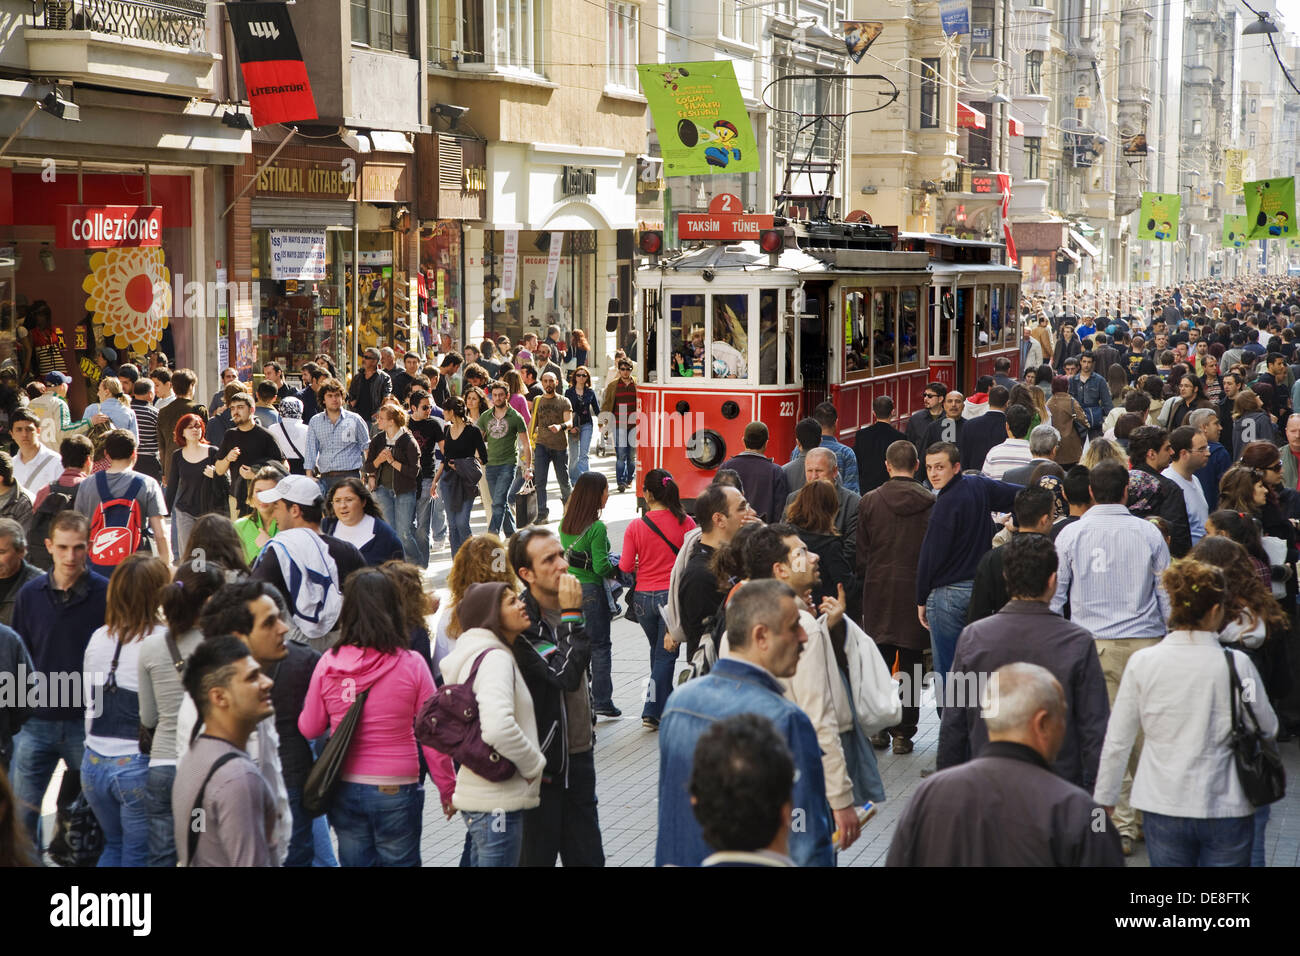 Tram on Istiklal Caddesi, Beyoglu district, Istanbul, Turkey - Stock Image